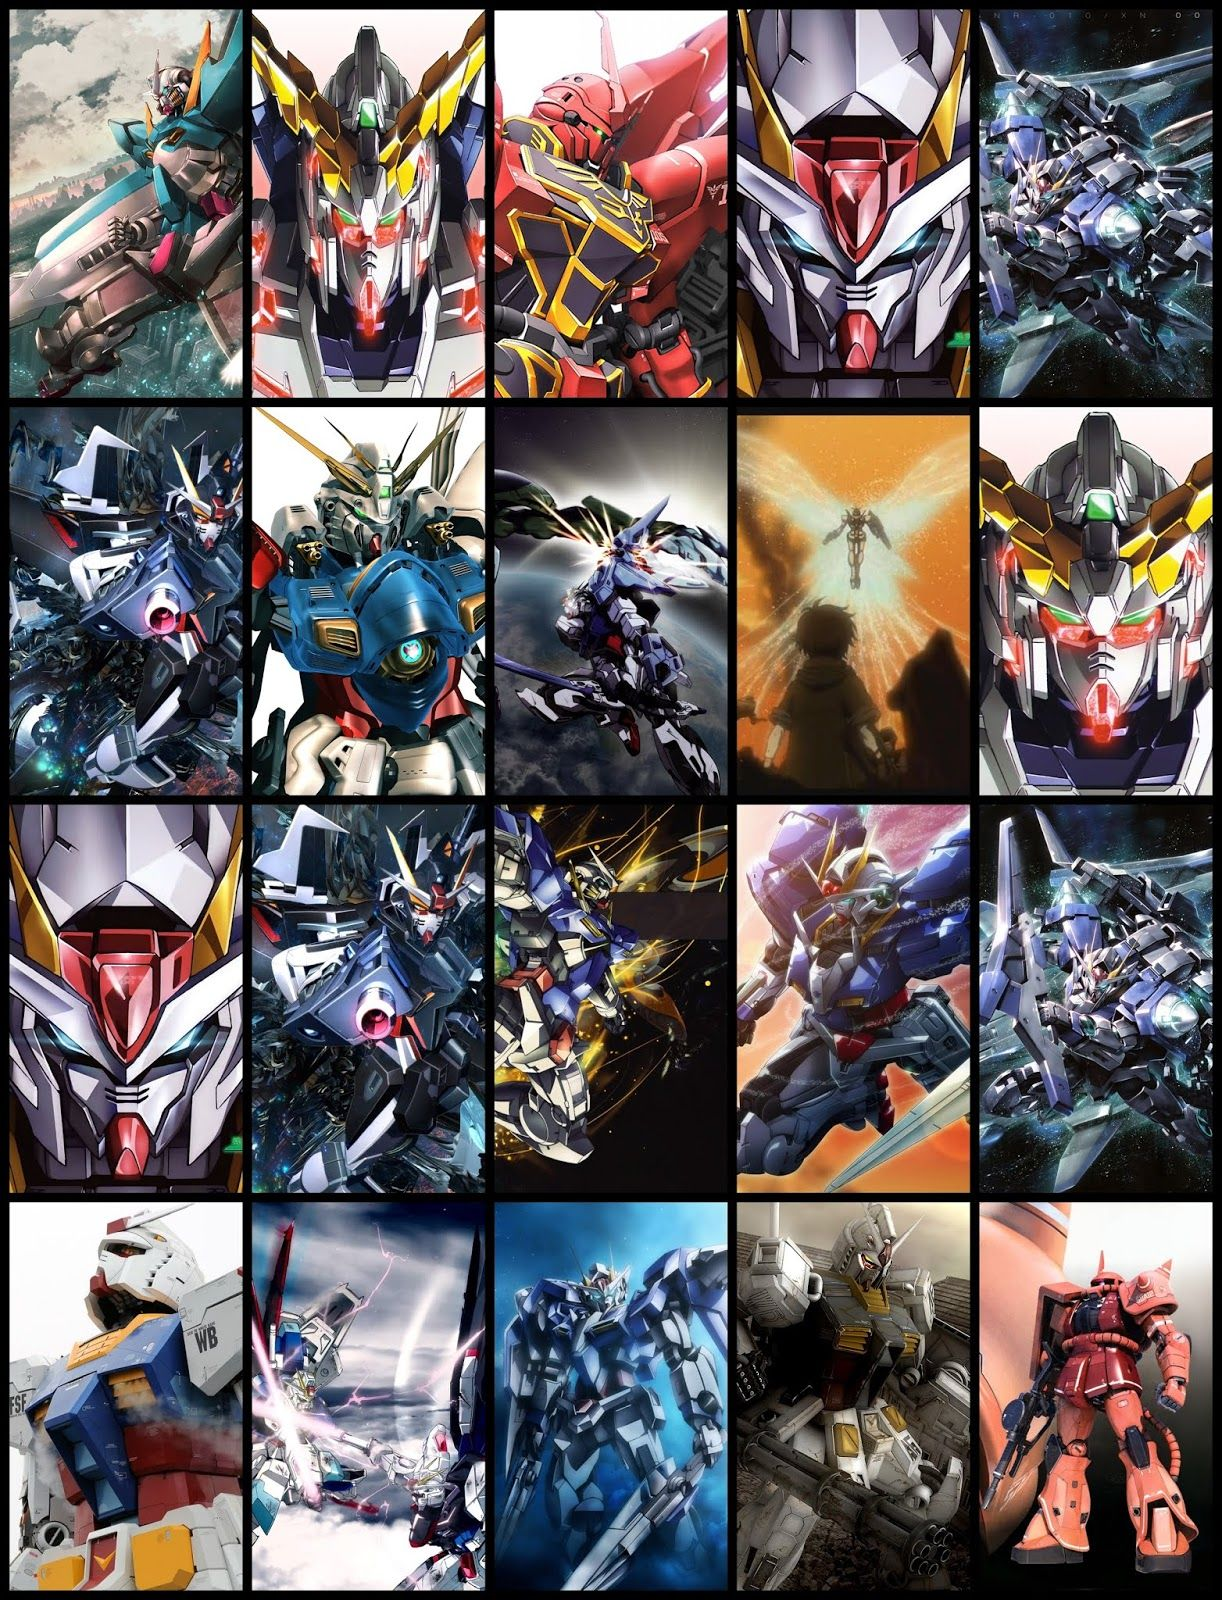 Gundam Wallpaper Pack For Android Phone (Part 01) Gundam